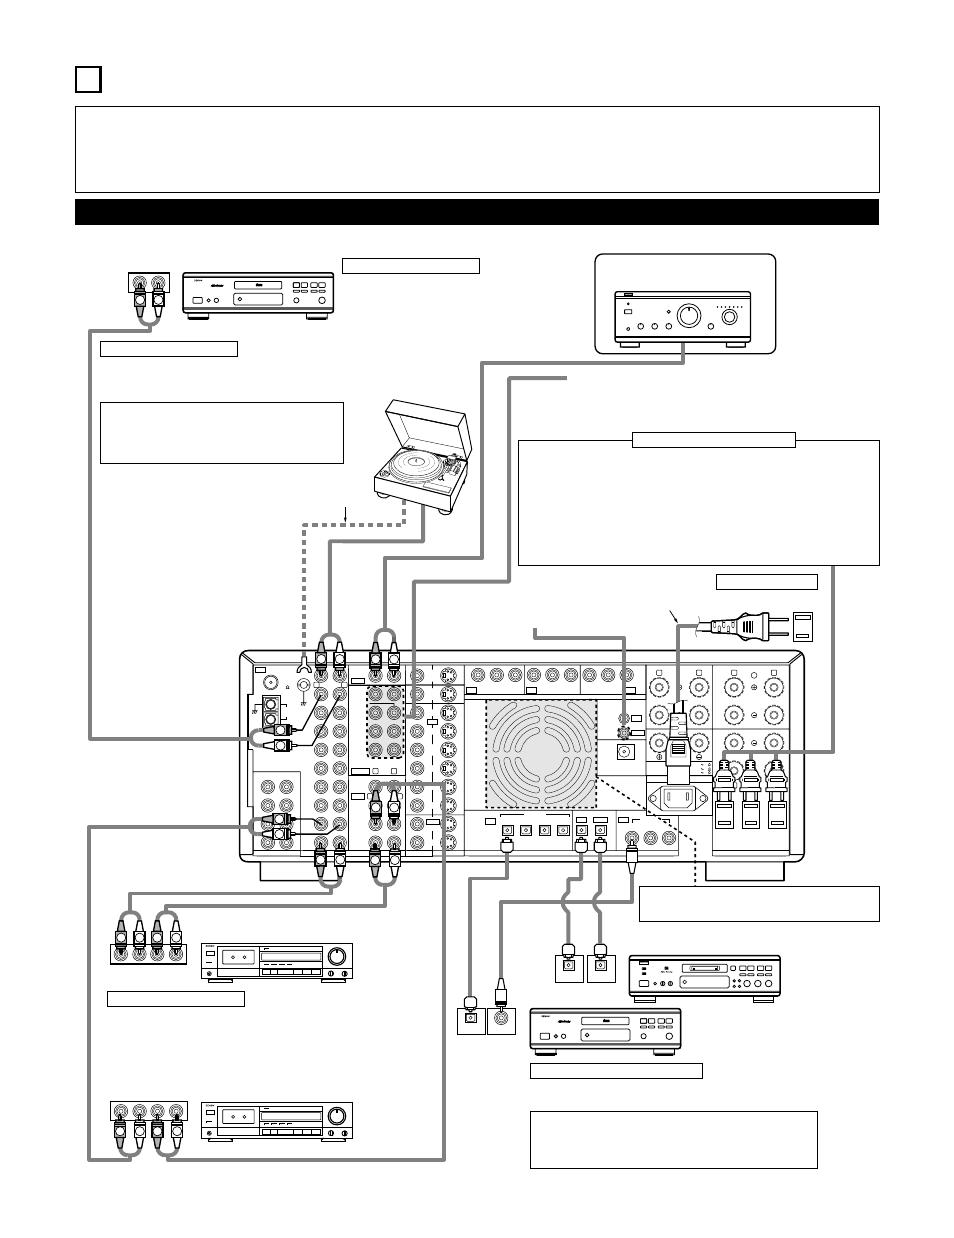 5connections connecting the audio components digital audio denon rh manualsdir com Denon AVR 3000 Denon AVR 3000